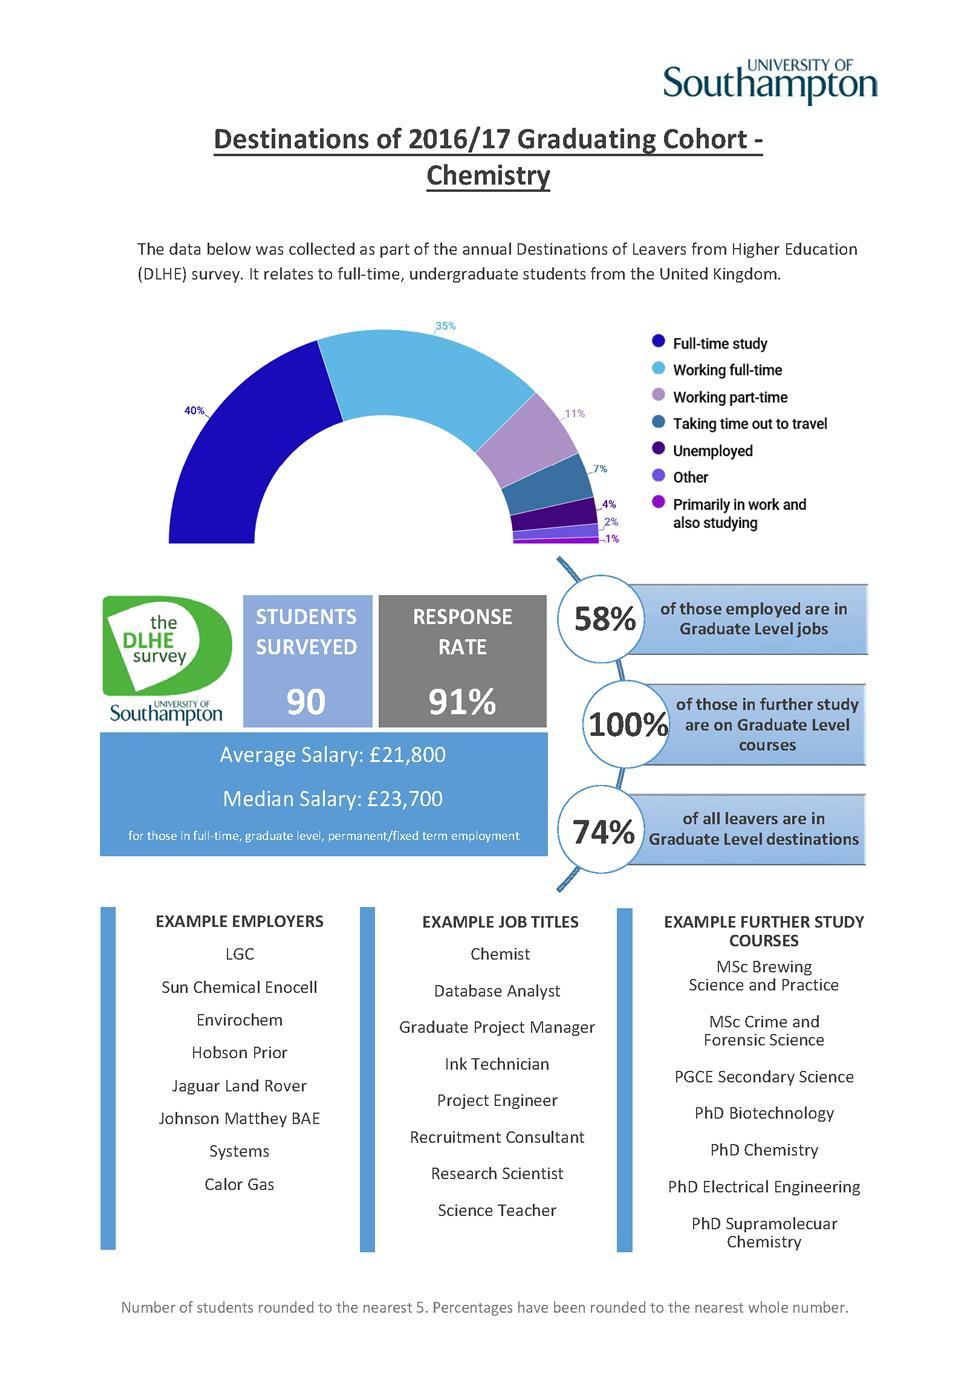 Chemistry DLHE Survey 2016-17